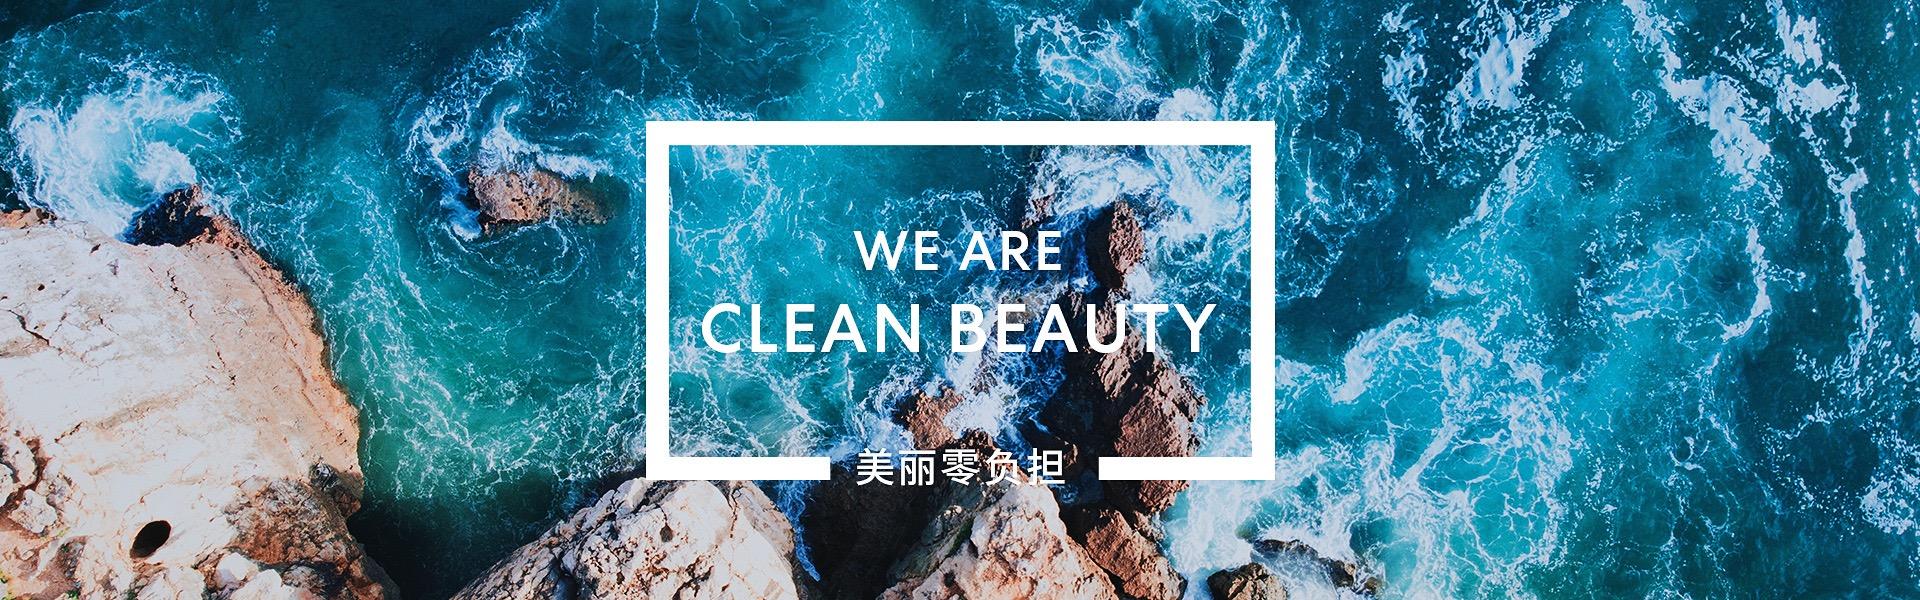 bareMinerals贝茗亮相日本 打造纯净美好时代